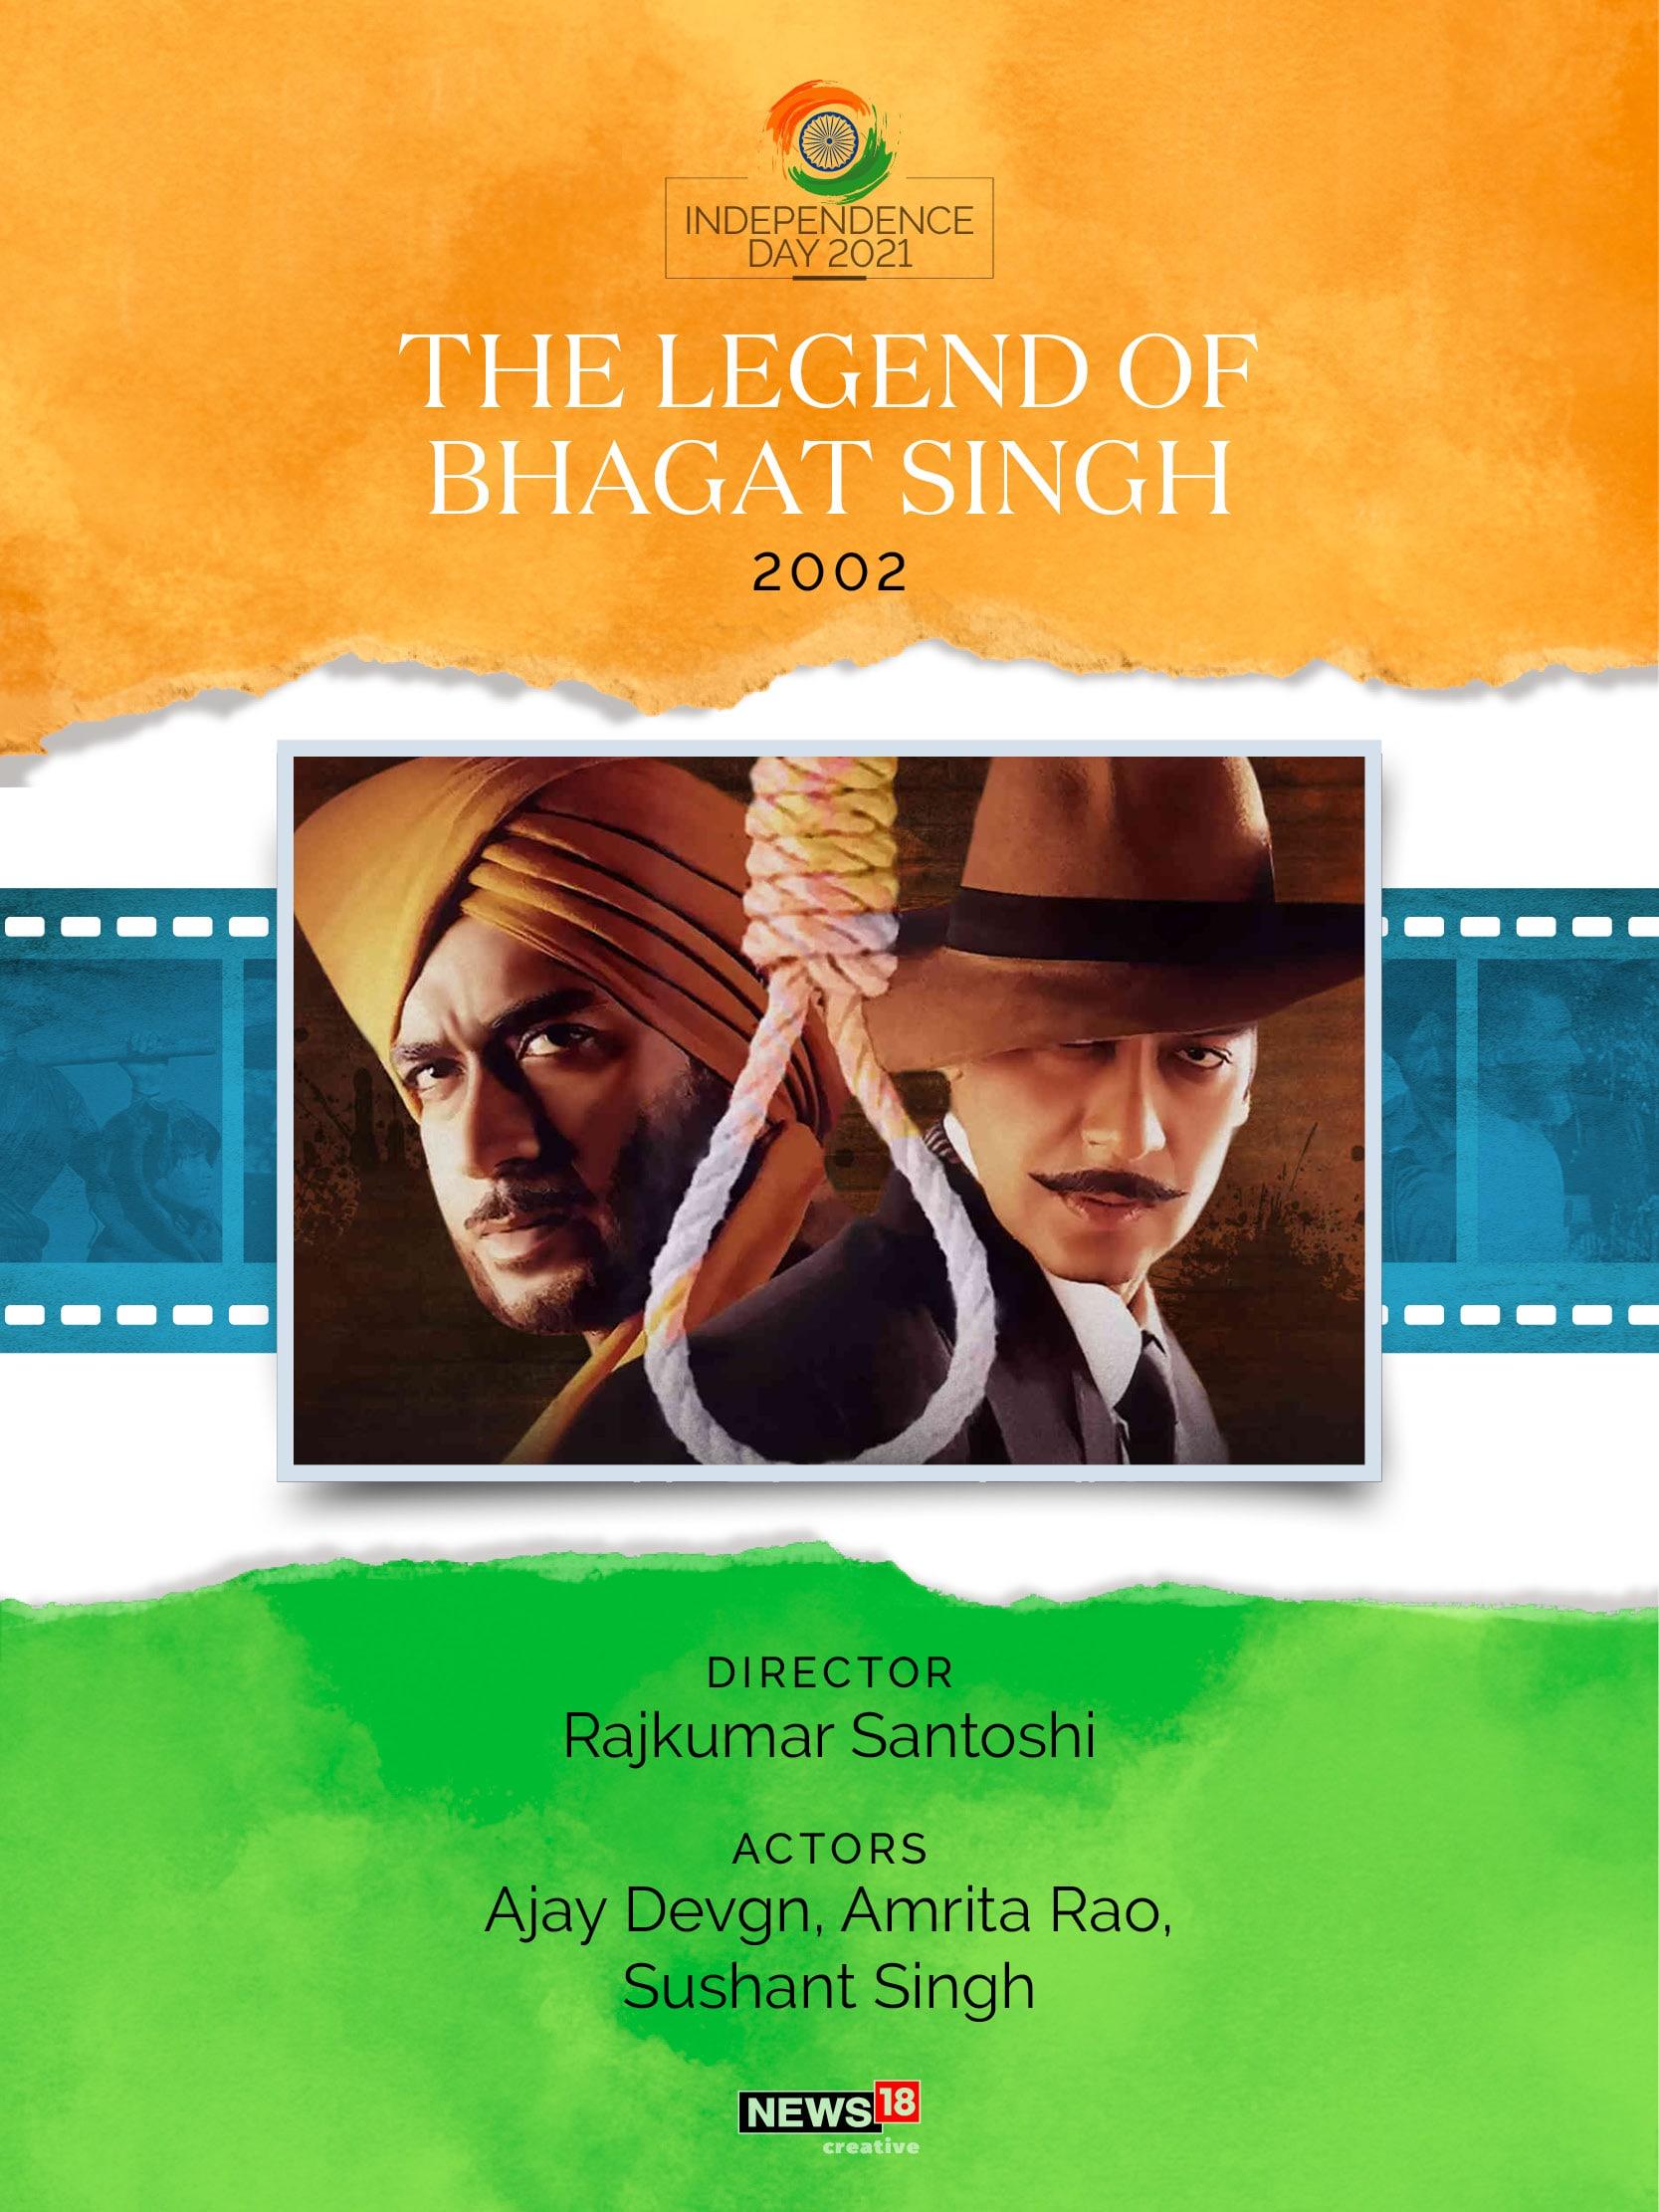 Ajay Devan, Bhagat Singh movie 2002, india independence day news, india news, independence day news, bollywood movies independence day, independence day movies, india patriotic films list, list of bollywood movies on independence day of india